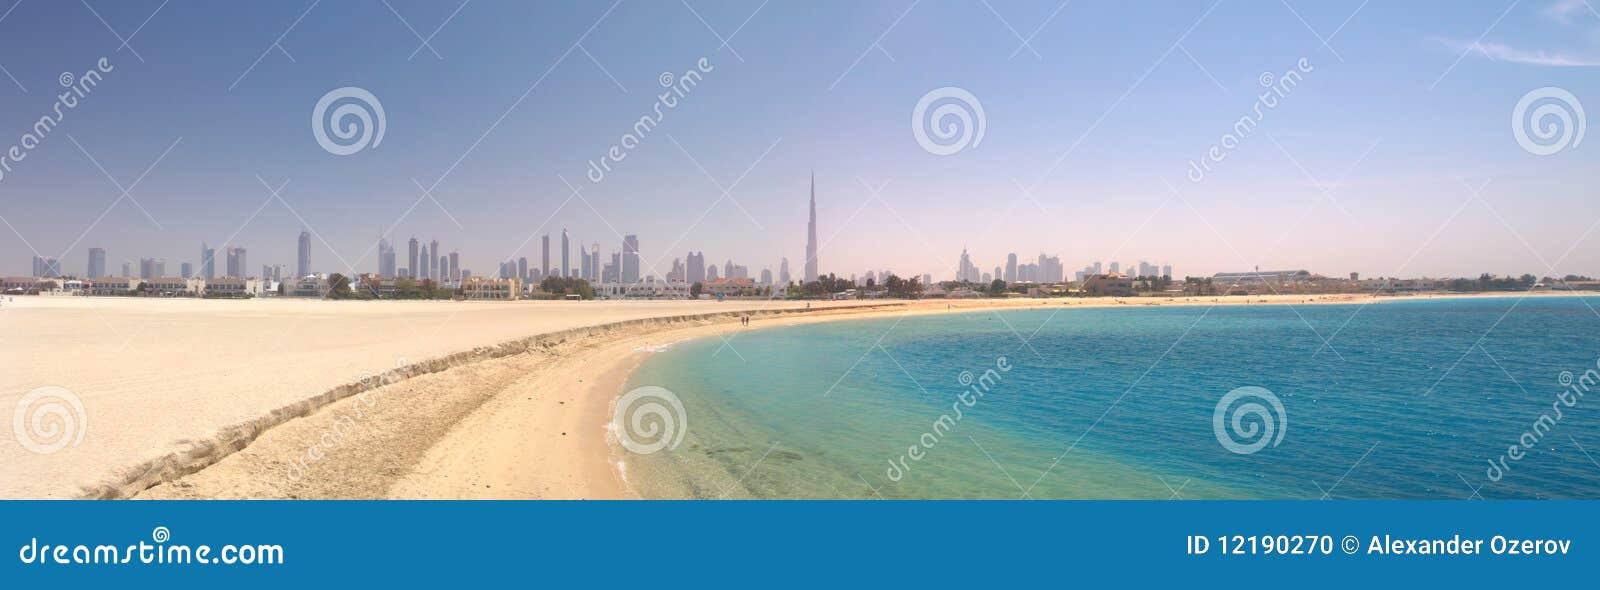 море панорамы Дубай пляжа красивейшее